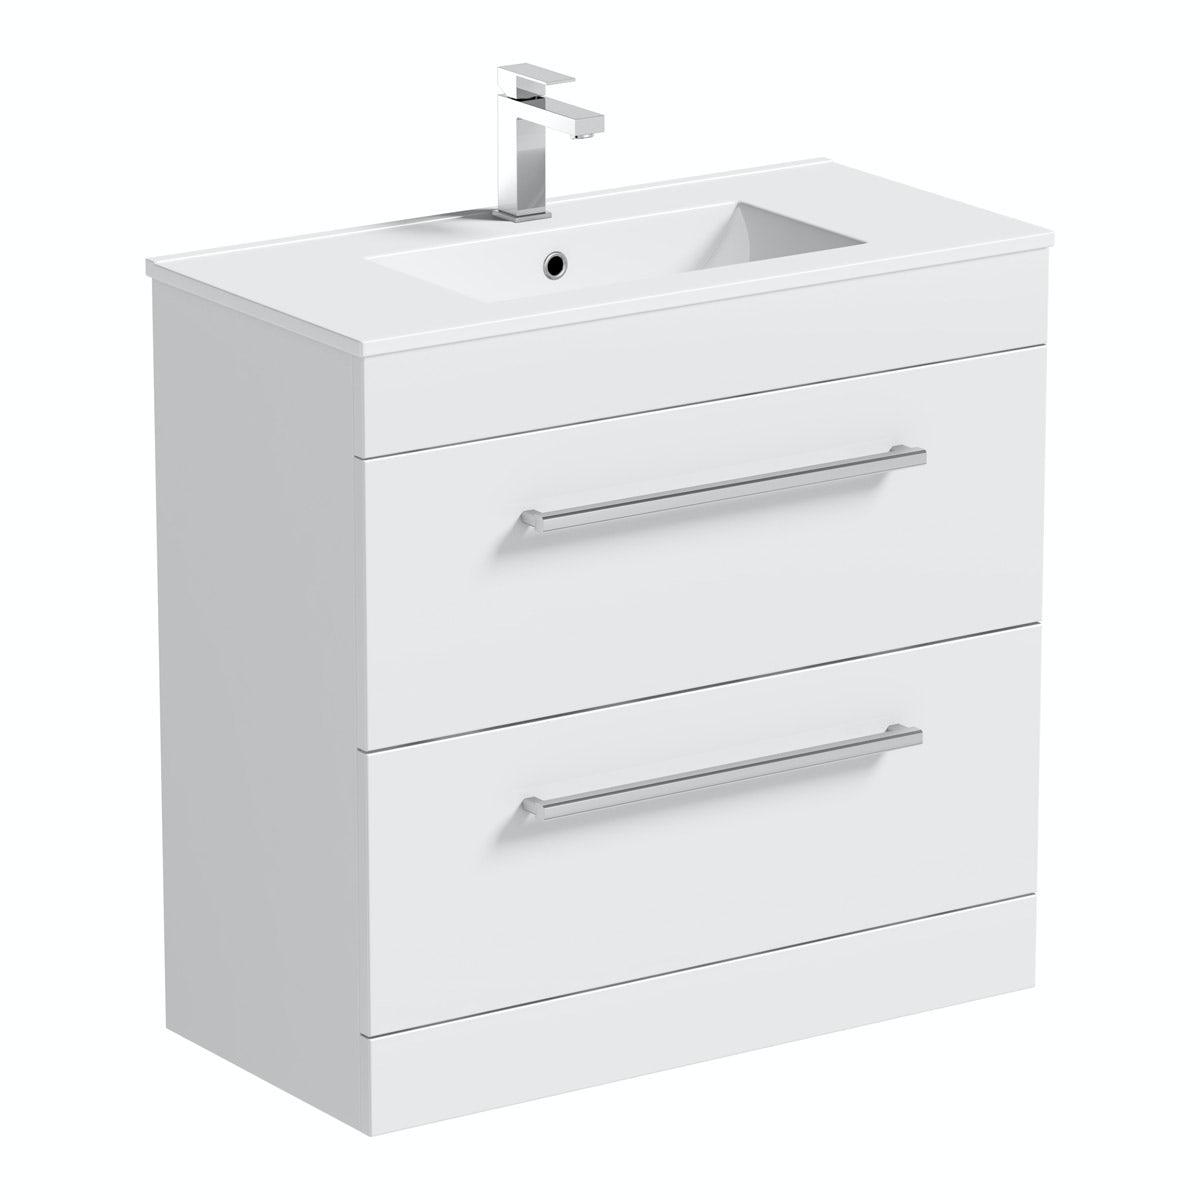 Orchard Derwent white vanity drawer unit and basin 800mm